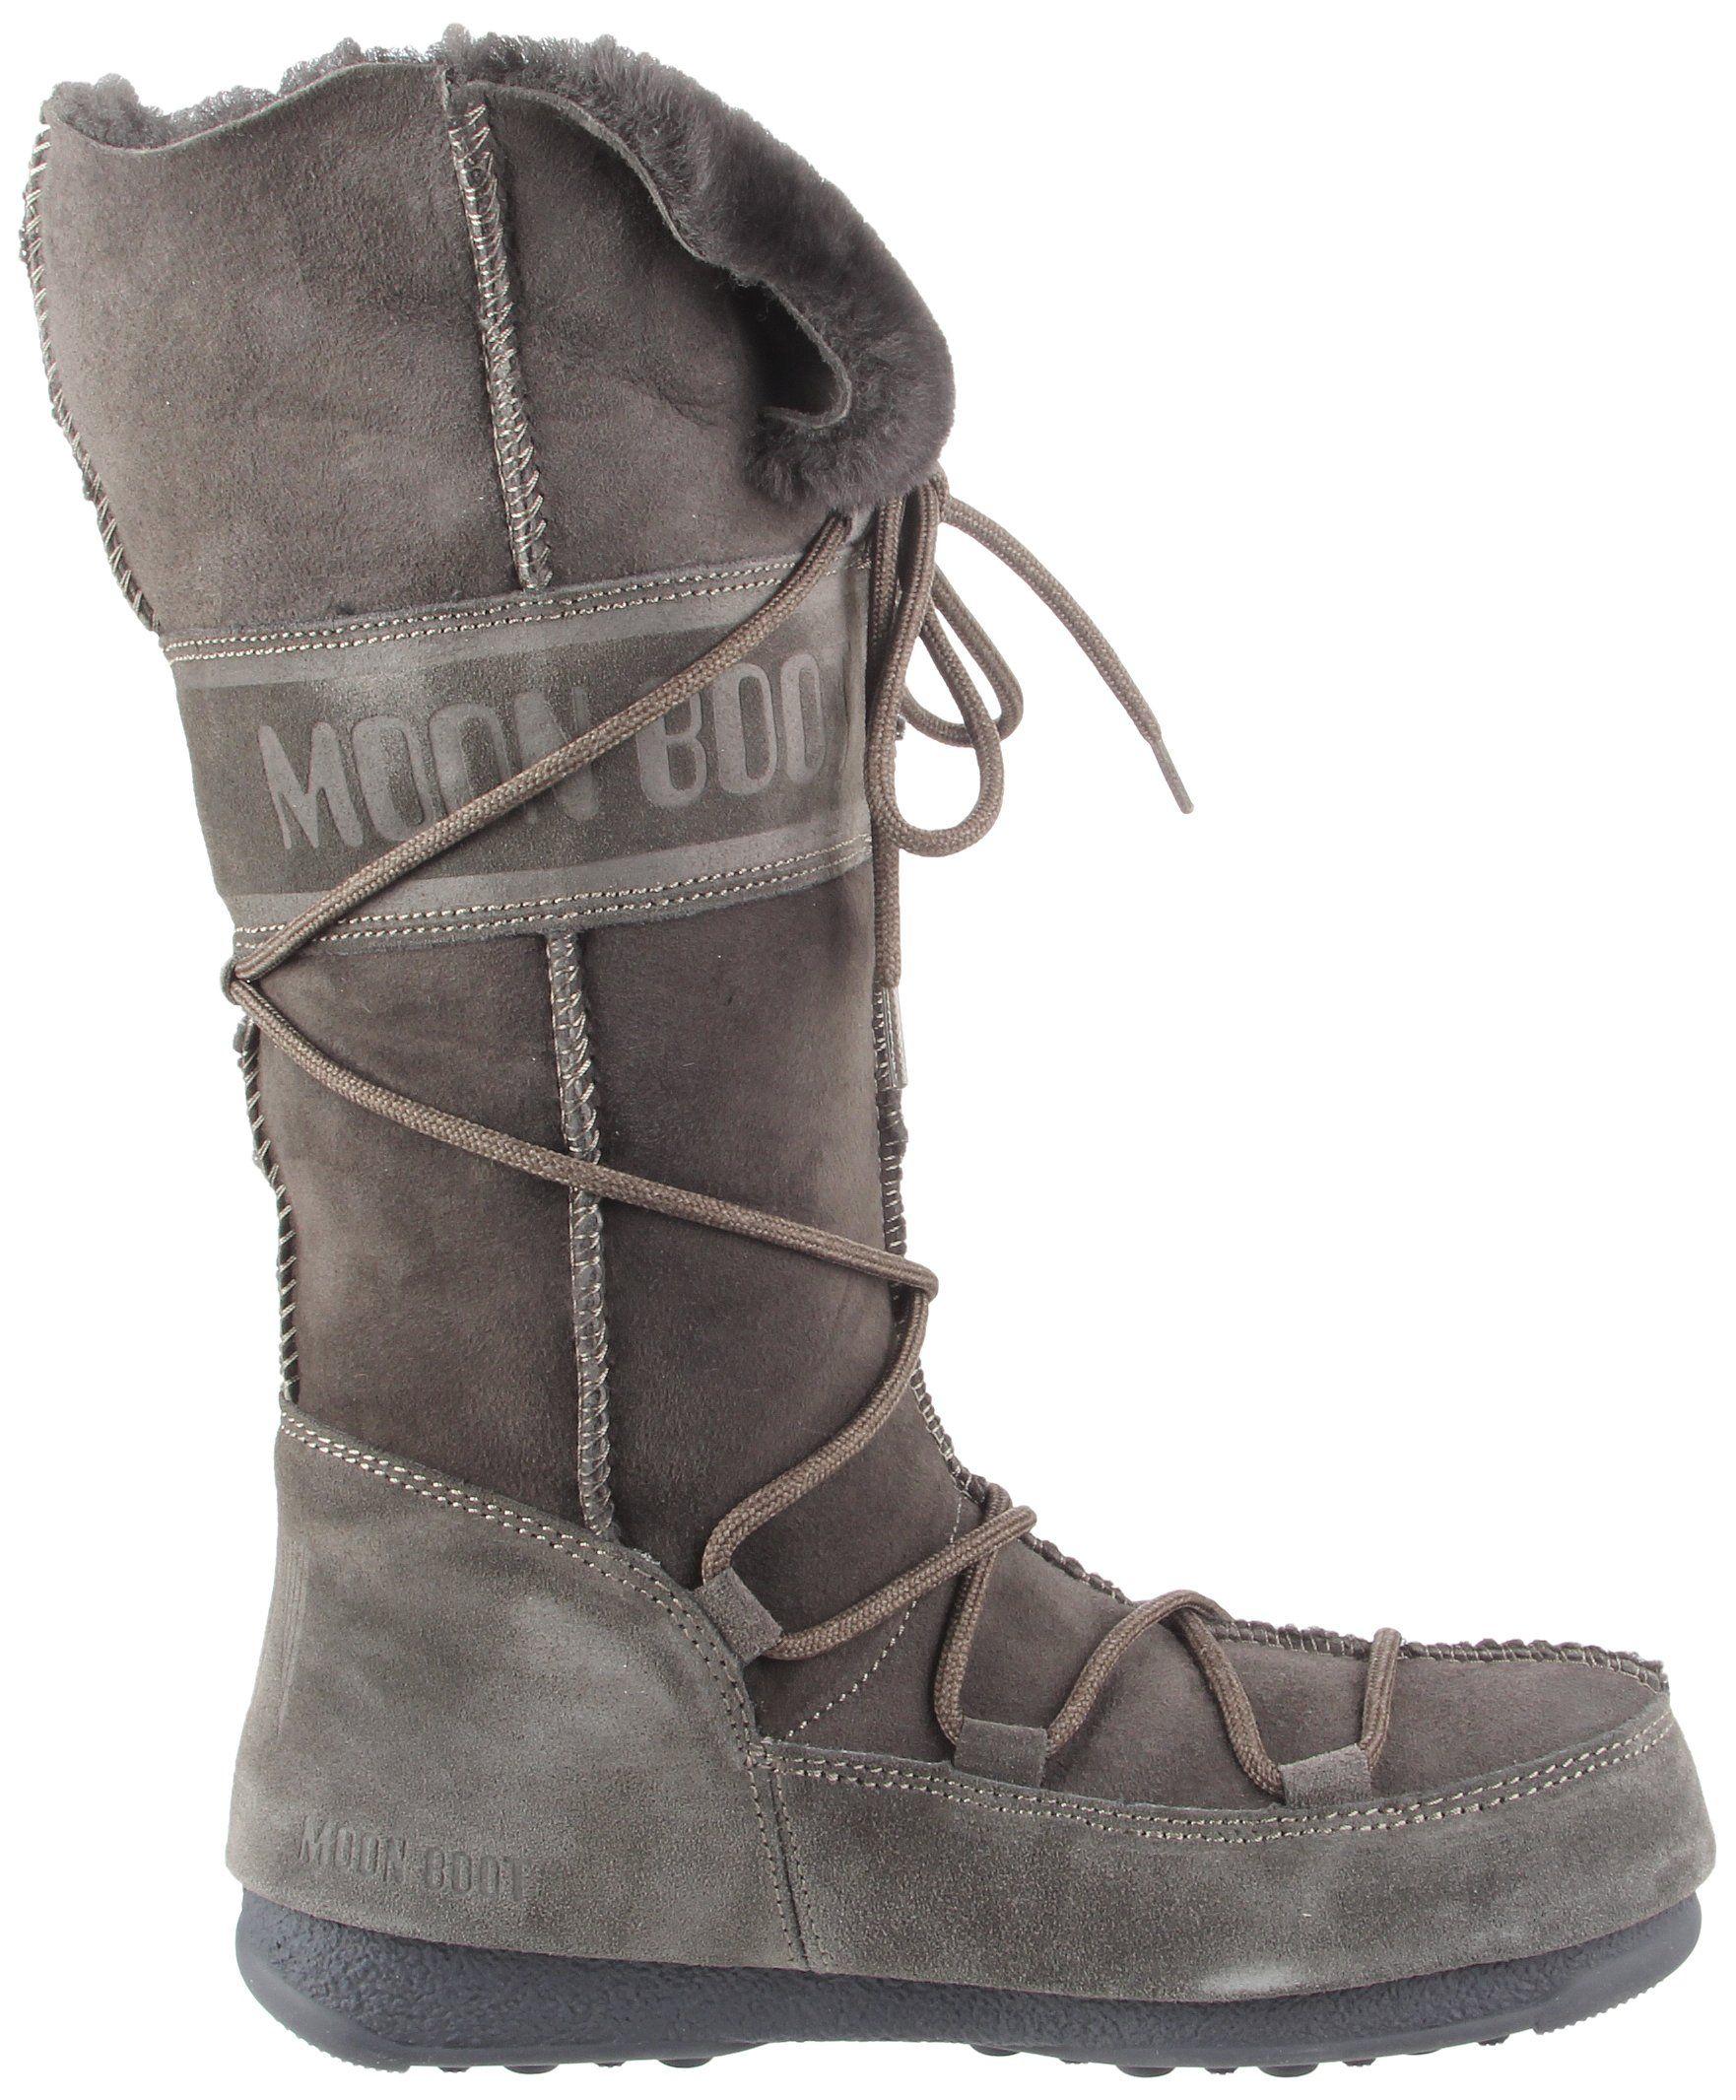 online store 78f99 071ee Amazon.com: Tecnica Women's 11 Vagabond Moon Boot: Clothing ...